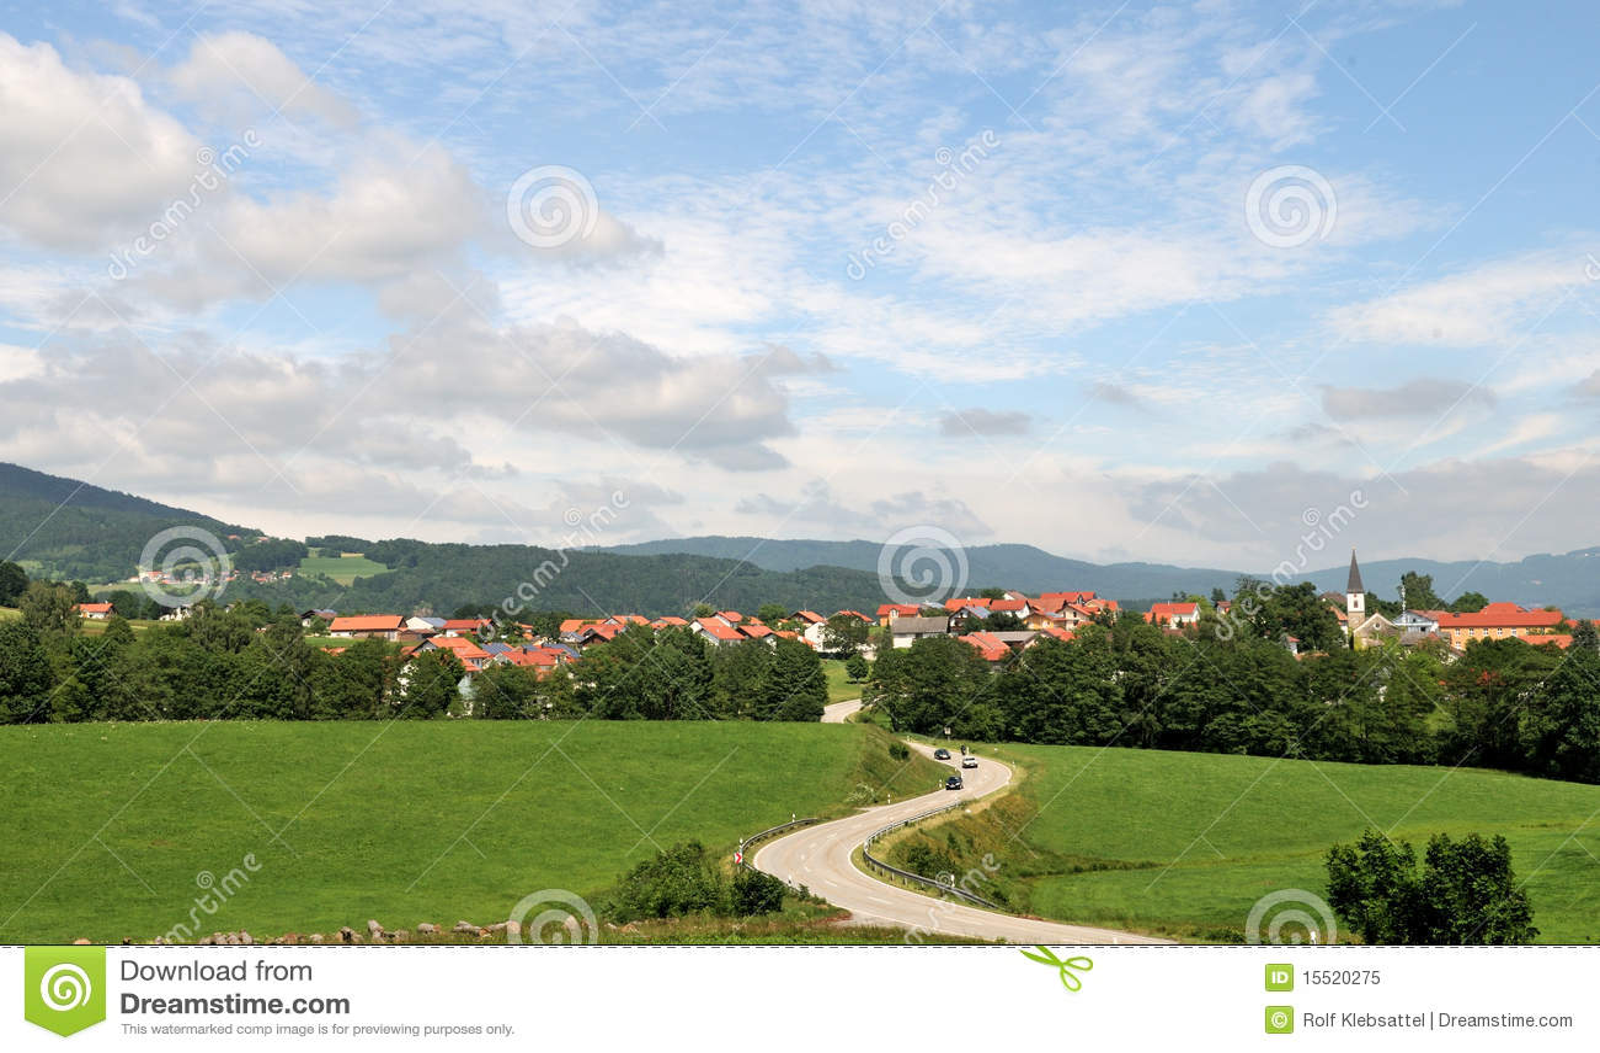 foto bavaria: